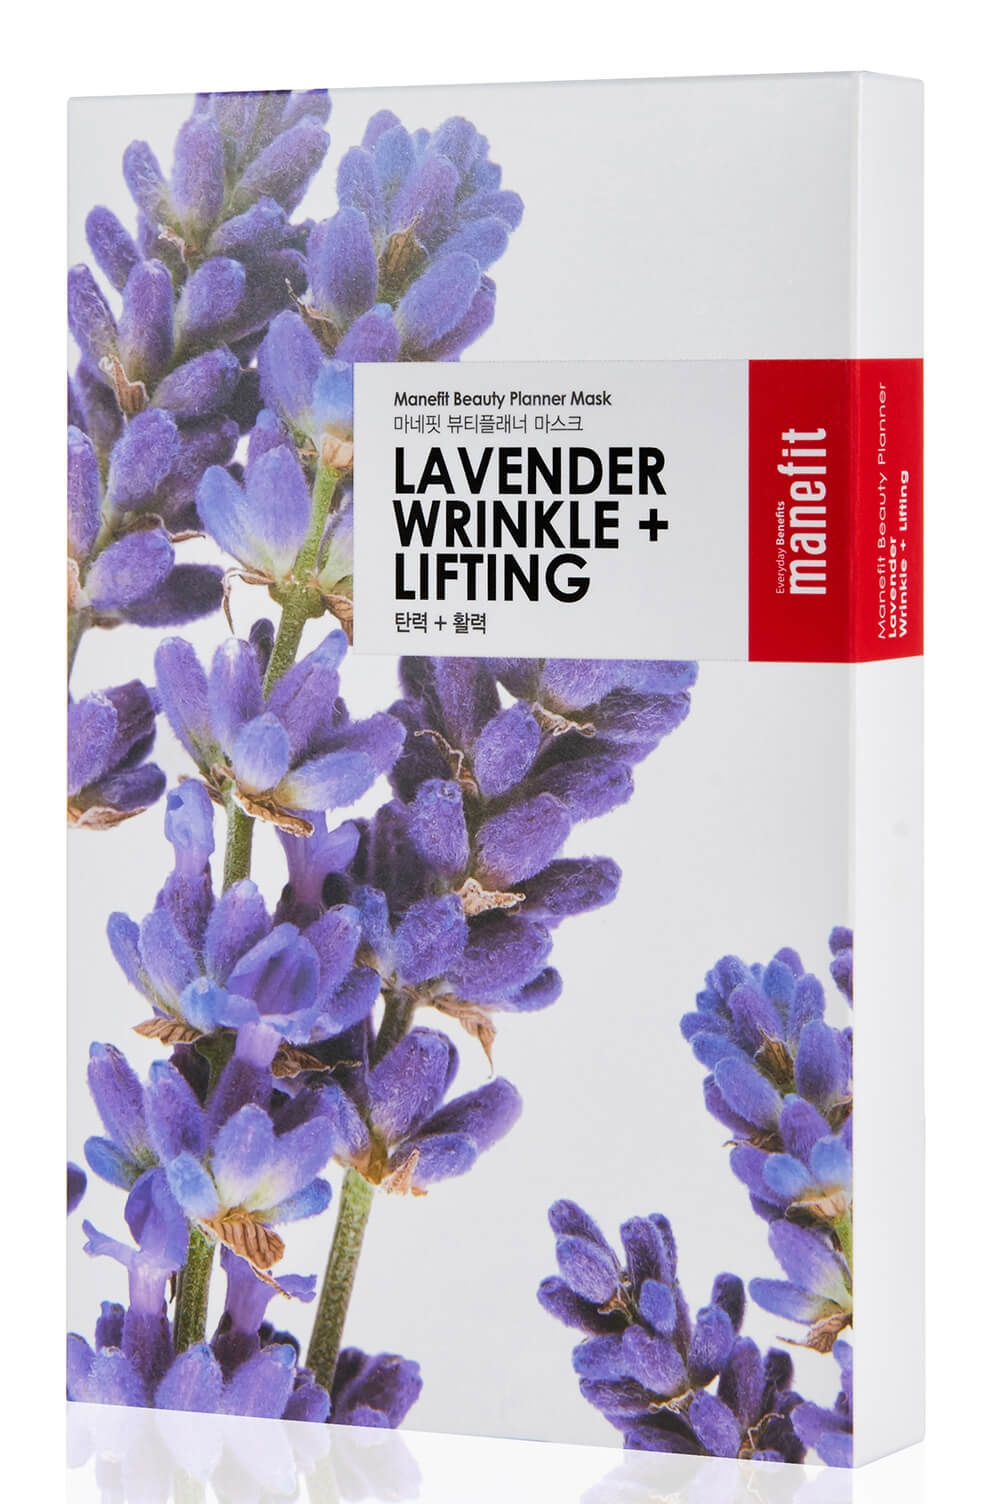 Manefit Beauty Planner Mask Lavender Wrinkle + Lifting